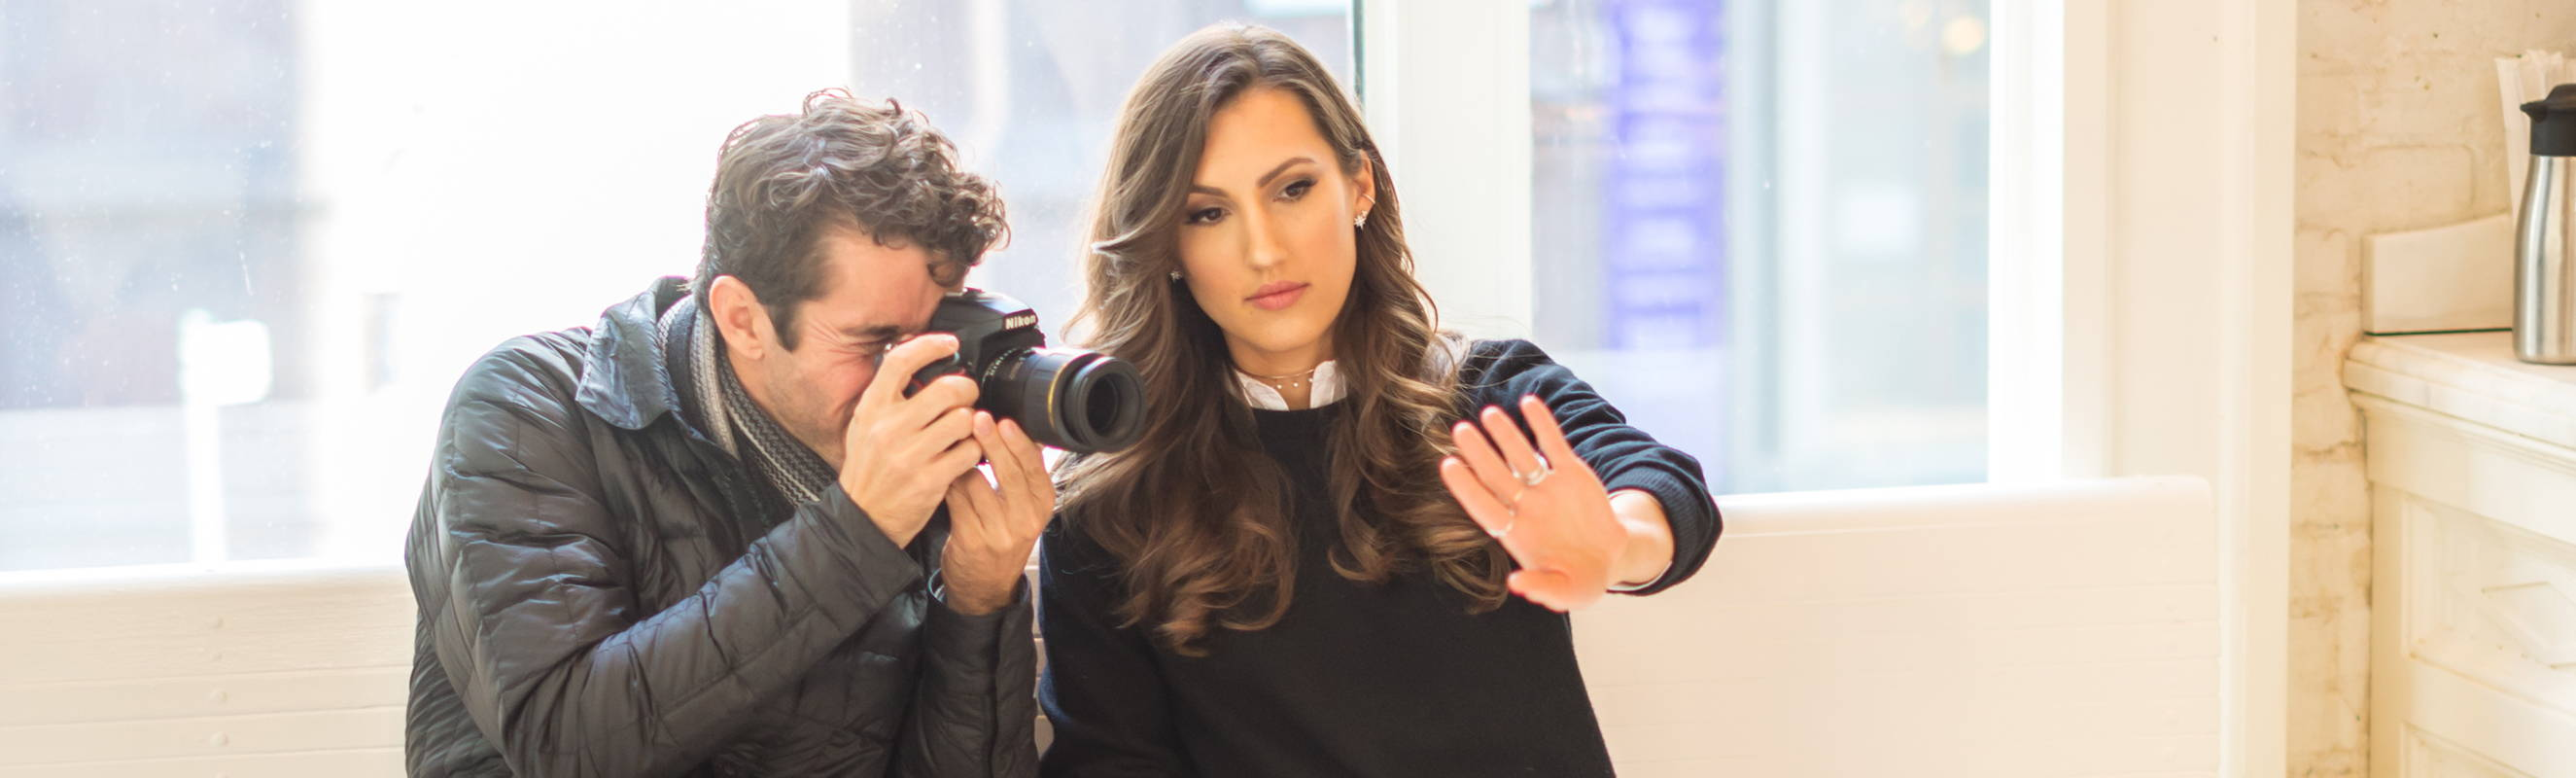 Nicole Wegman, Founder & CEO posing for a hand selfie